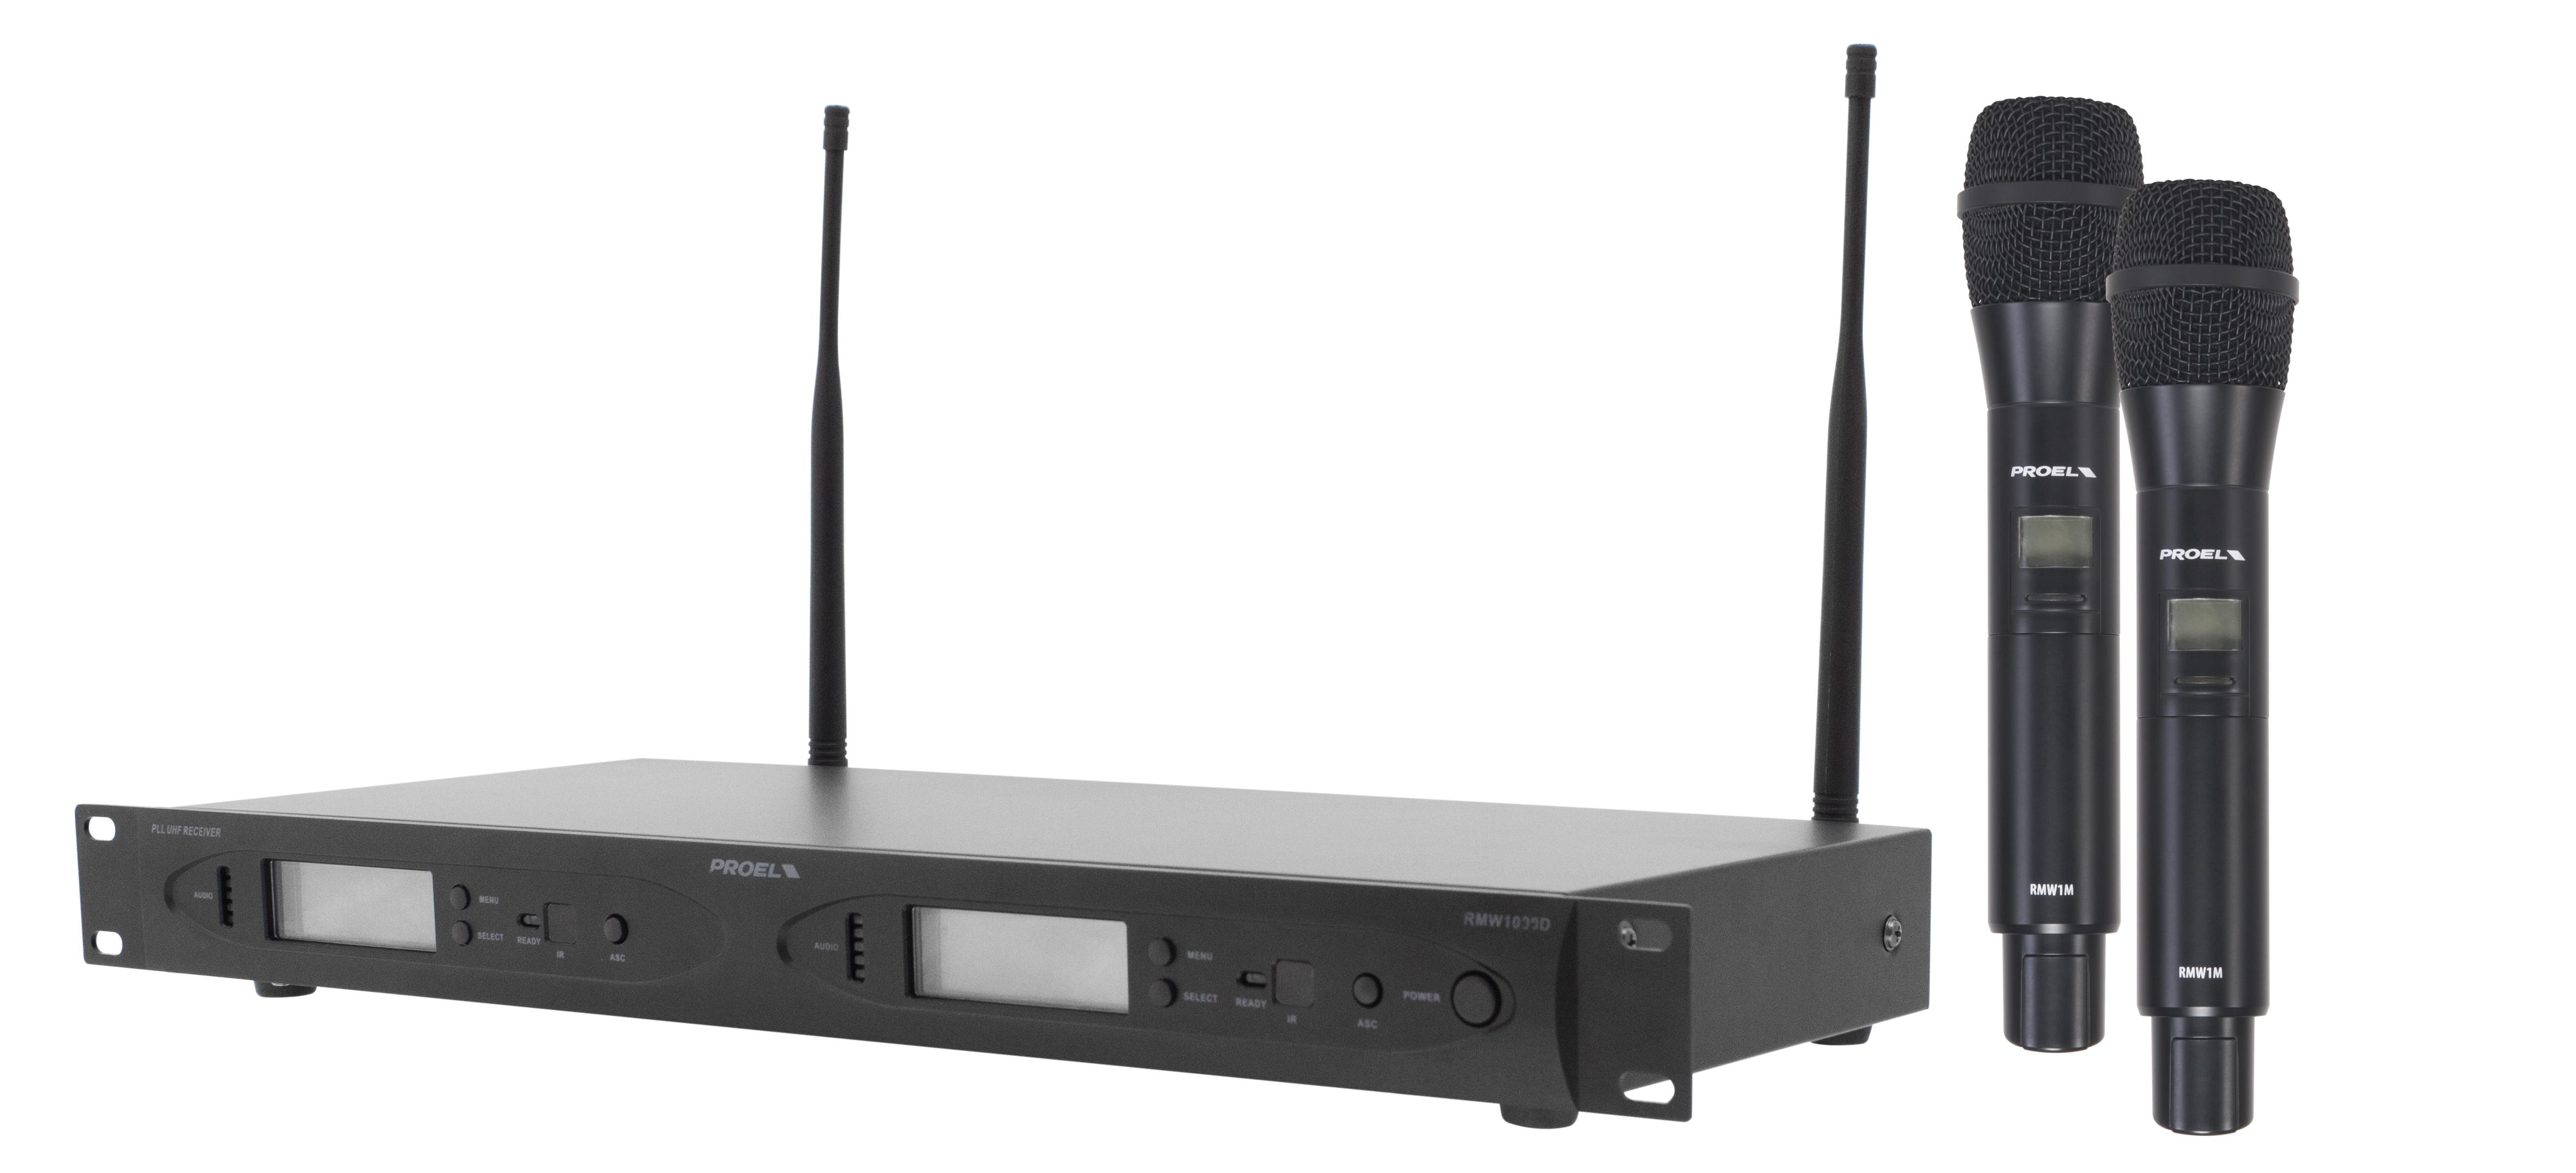 PROEL RMW1000DM - Radiomicrofono Handheld �doppio canale �UHF �uscite indipendenti �1U rack - Voce - Audio Microfoni - Wireless Voce